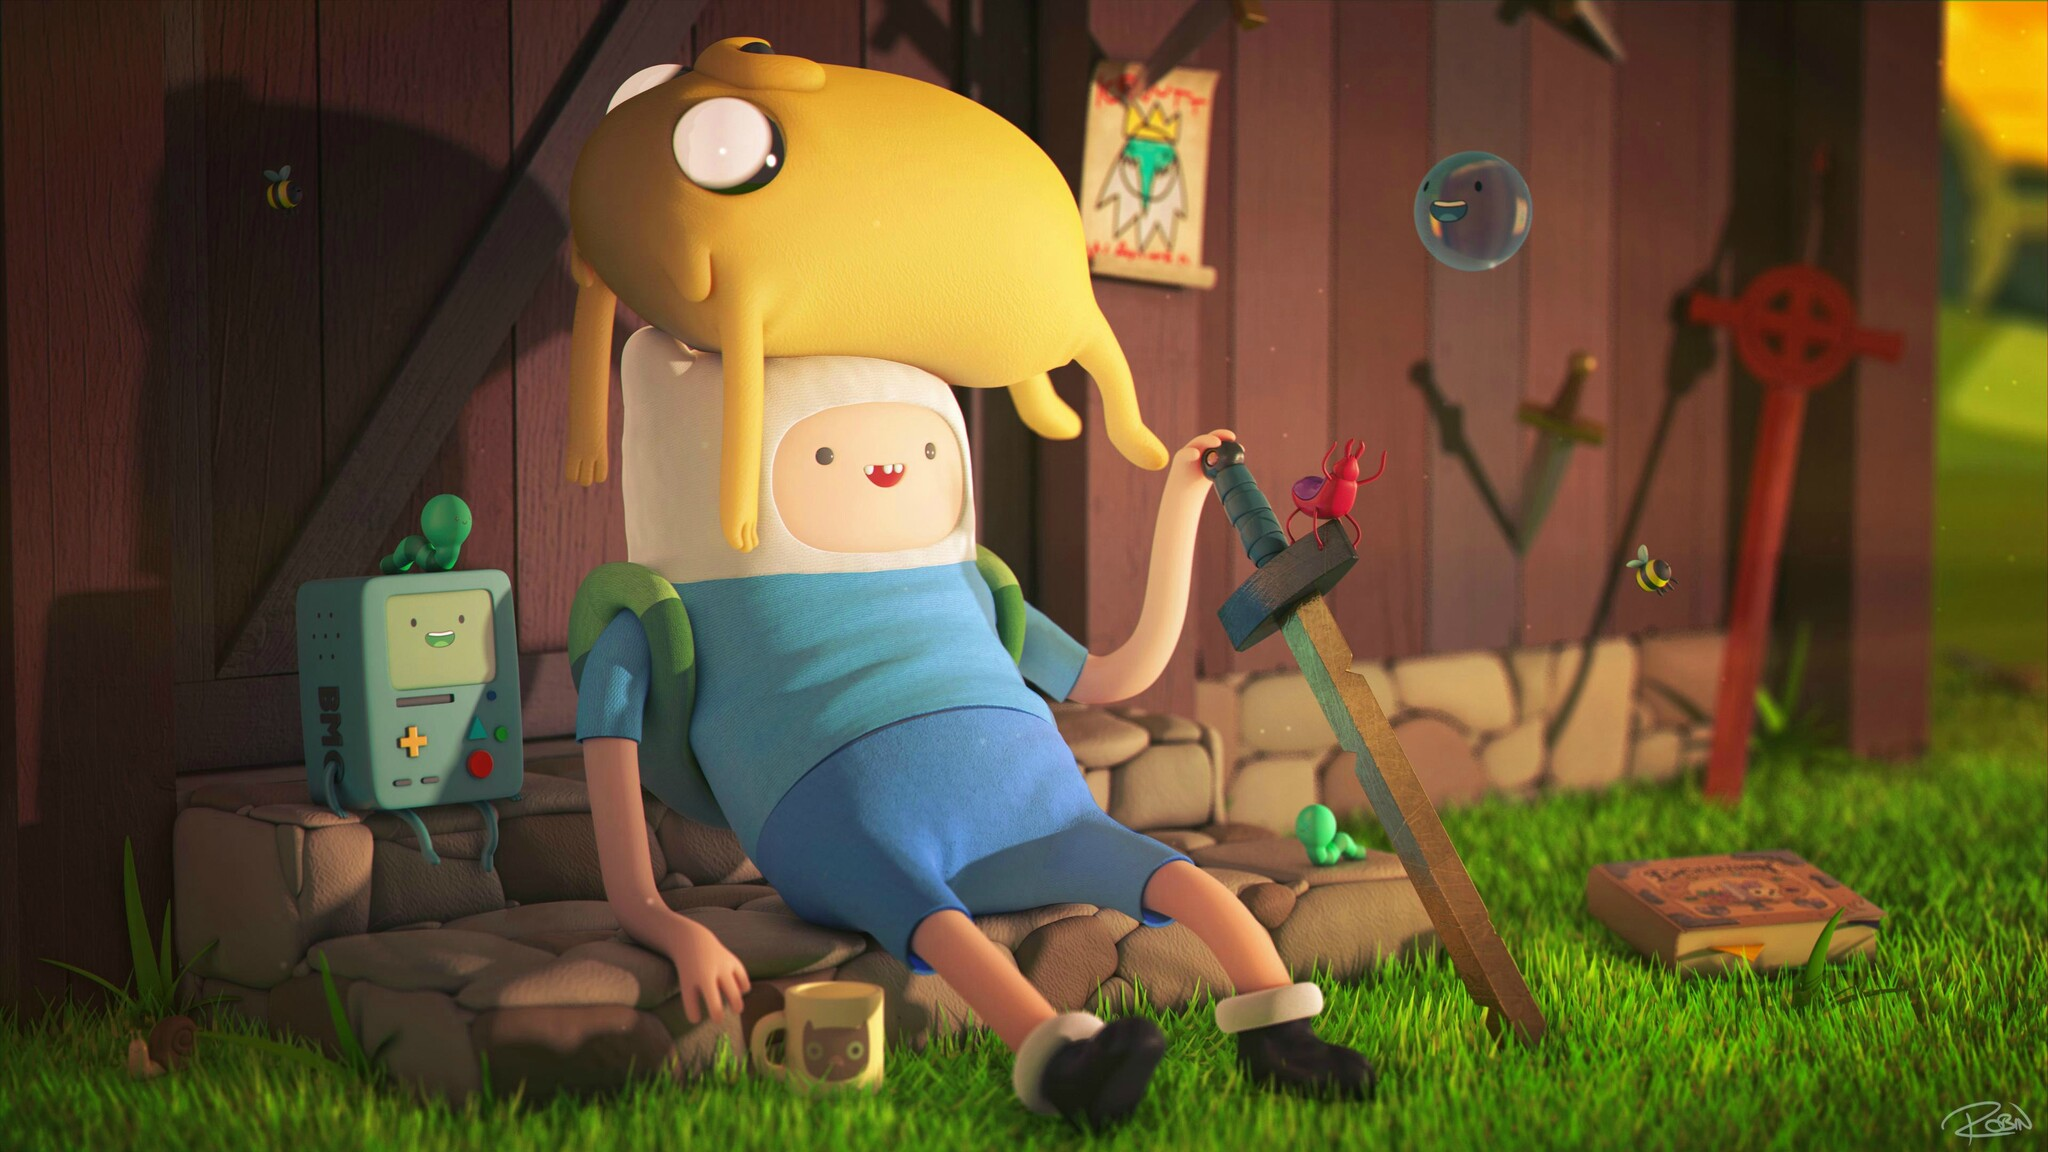 2048x1152 Adventure Time 2048x1152 Resolution HD 4k ...